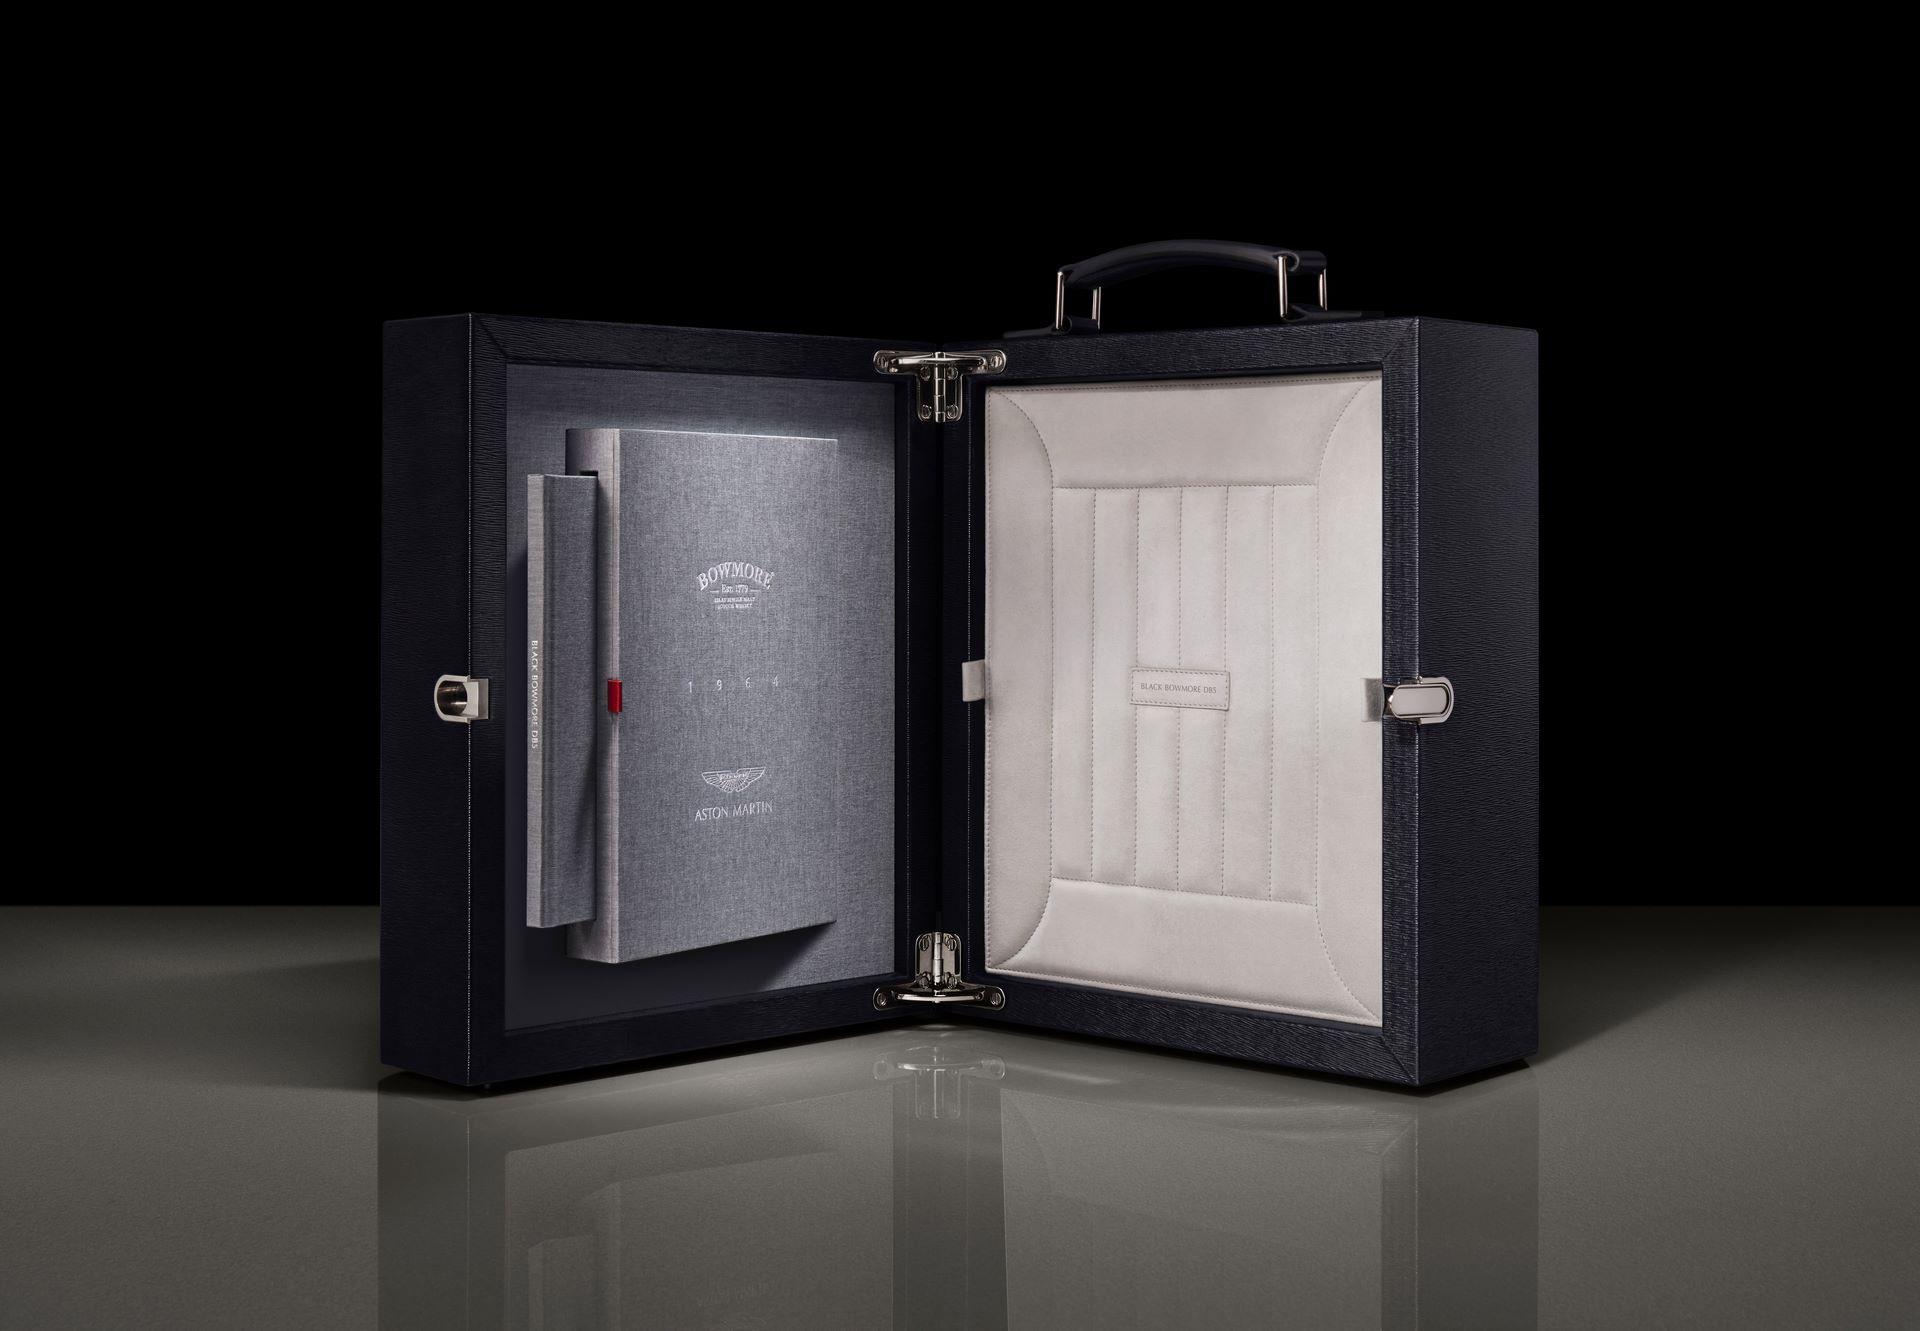 Black-Bowmore-Aston-Martin-DB5-1964-Whisky-1